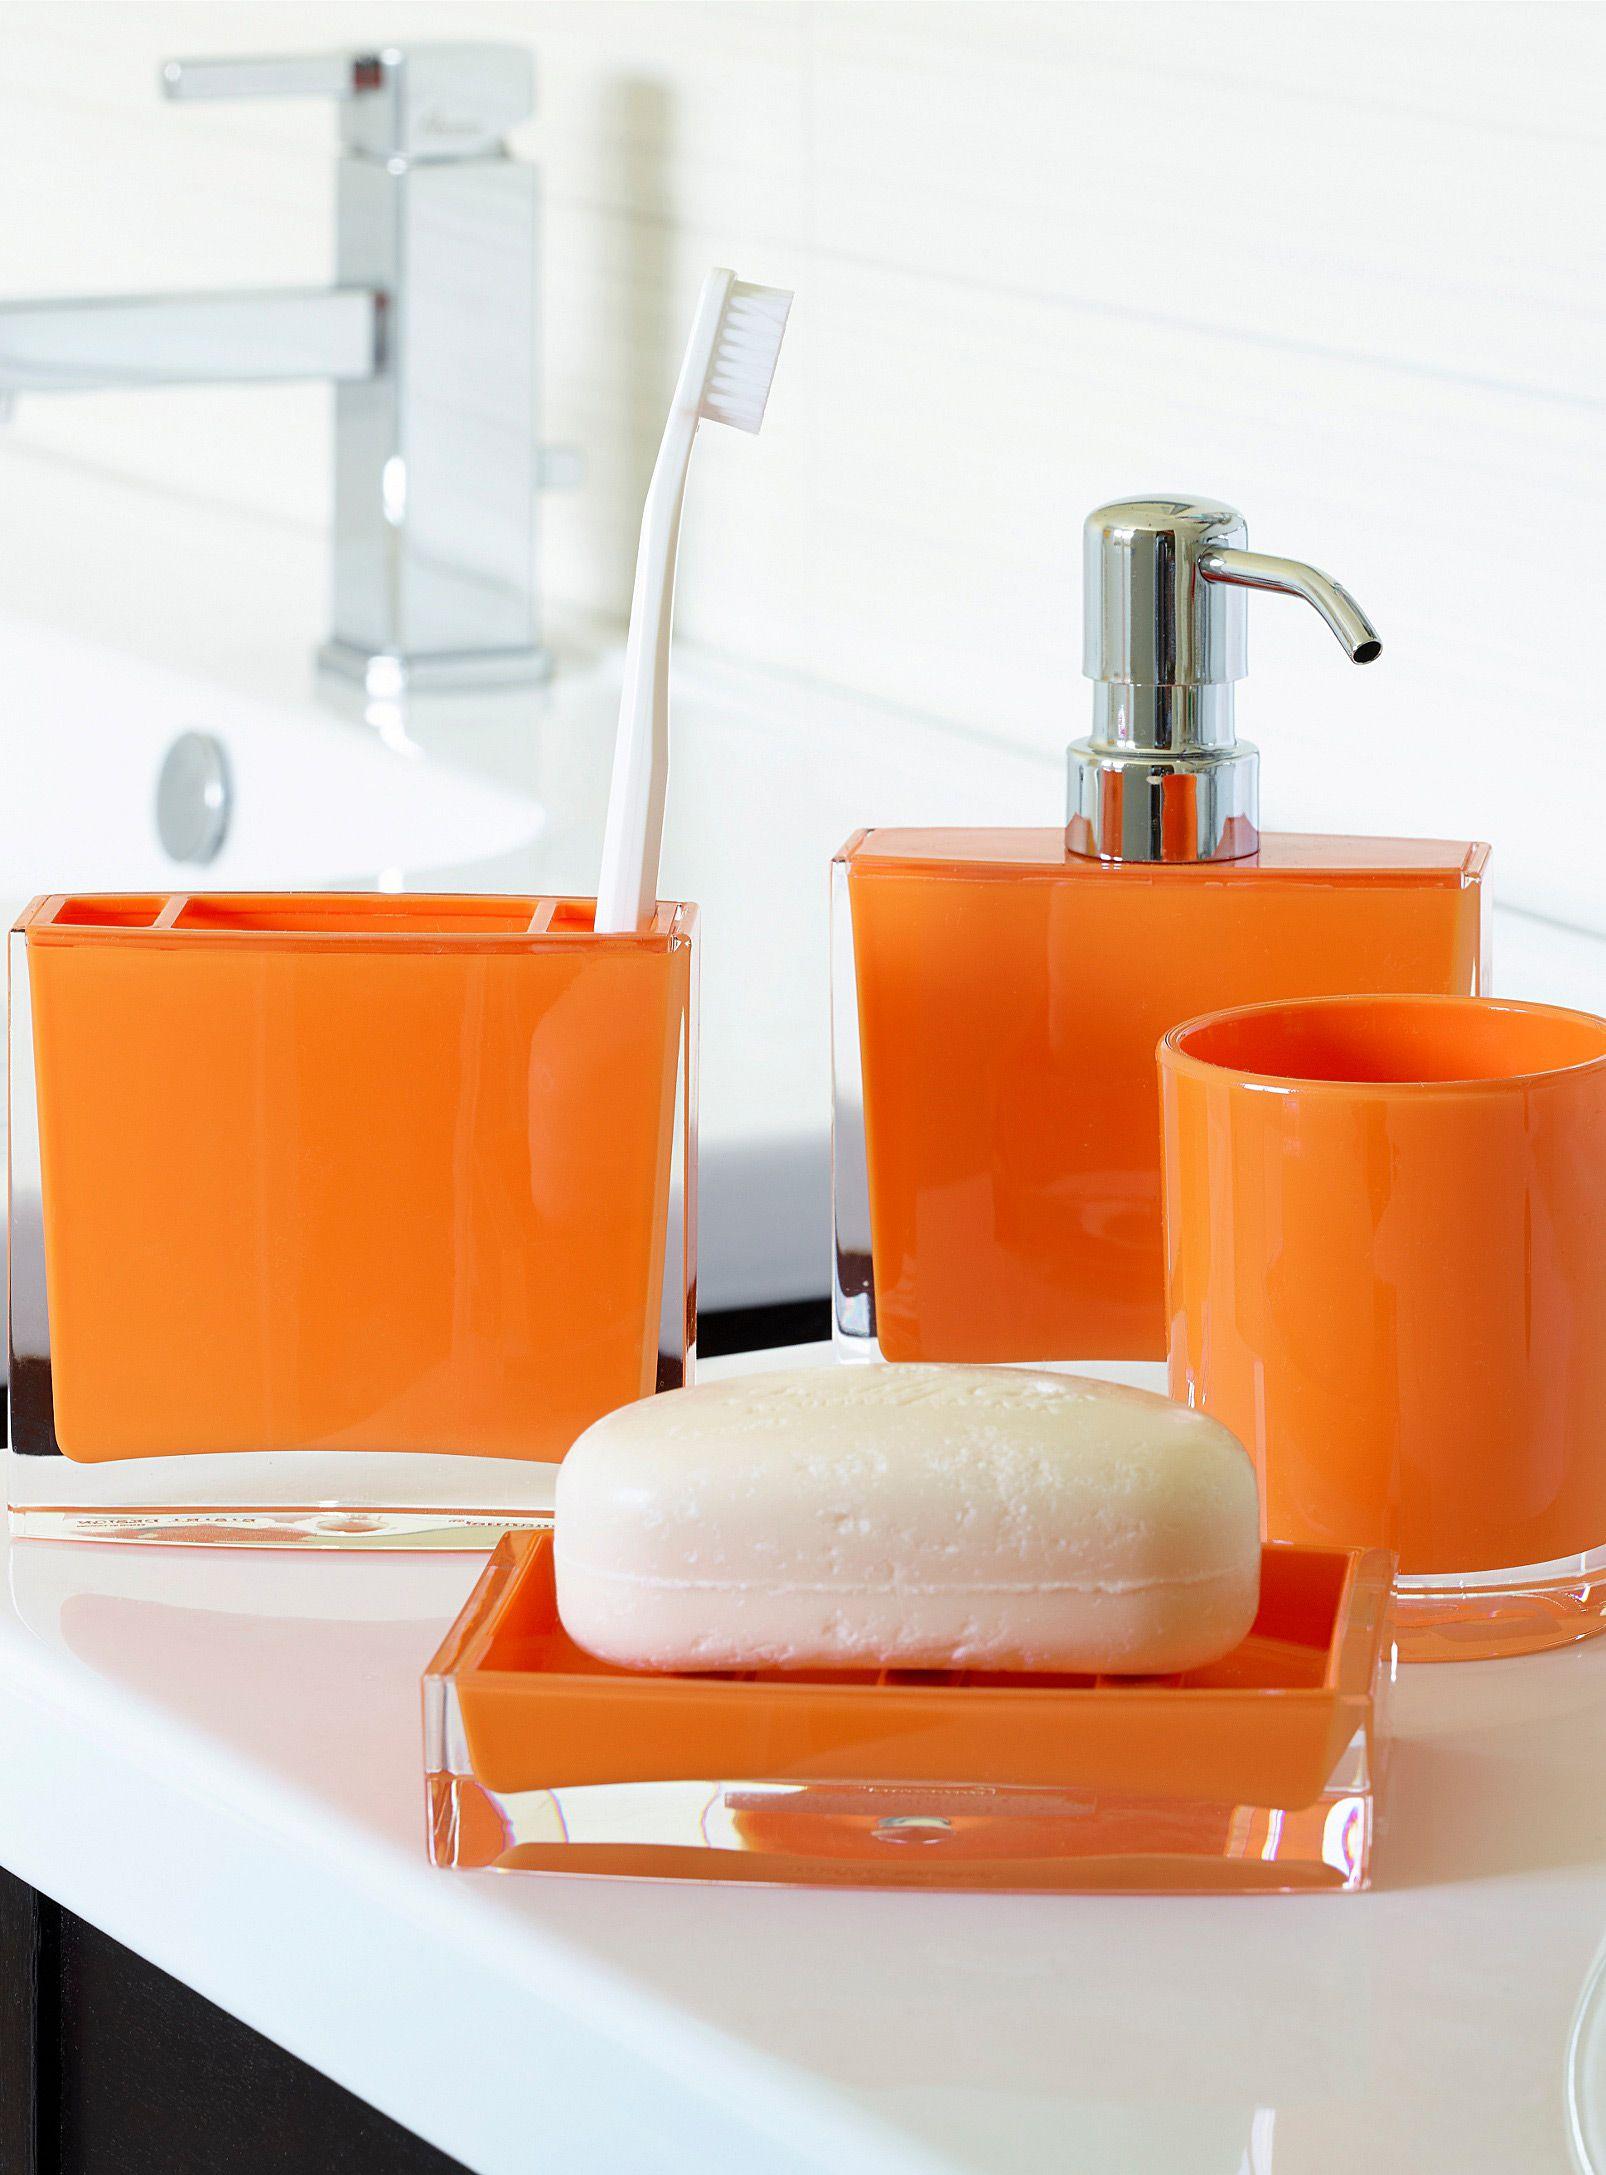 Shop Kids Bathroom Decor Accessories Online In Canada Simons